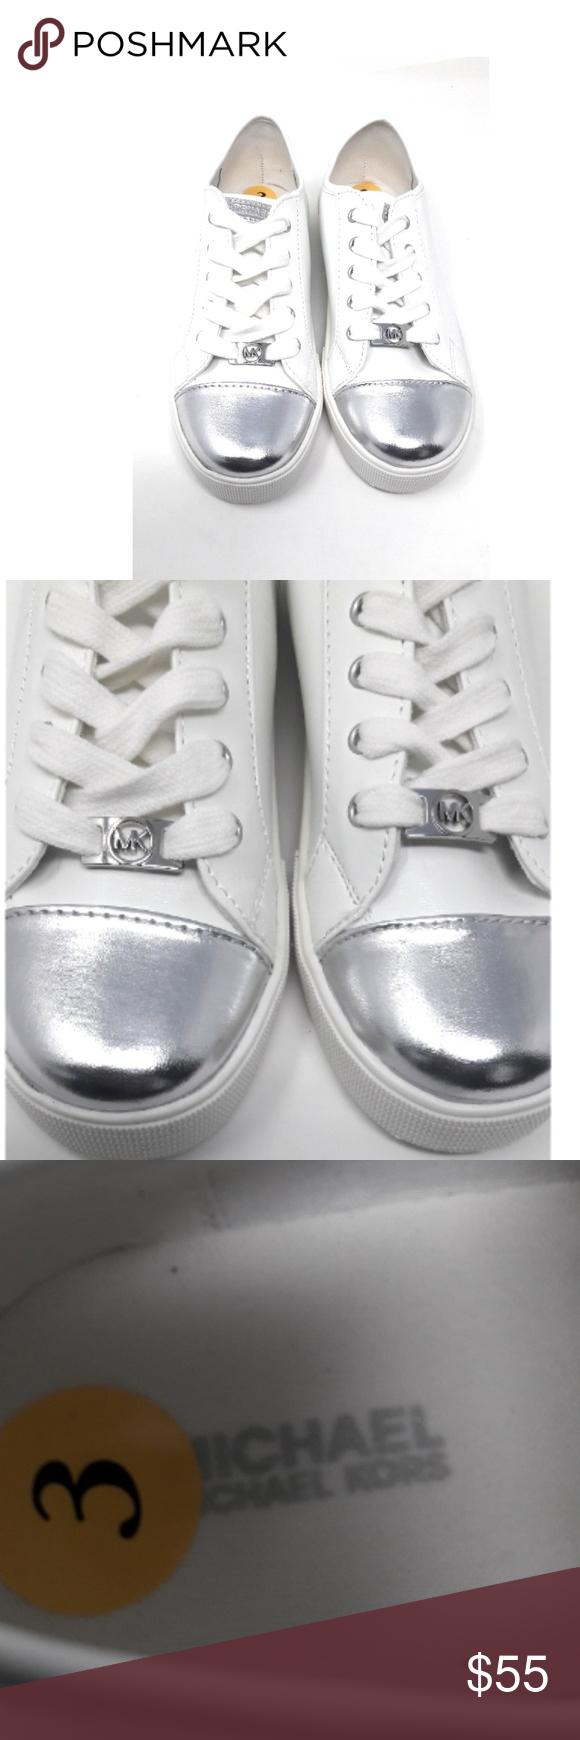 c3d029aa0 Michael Kors Girl's White Silver Sneakers Size 3 Michael Kors girls white  and silver metallic sneakers